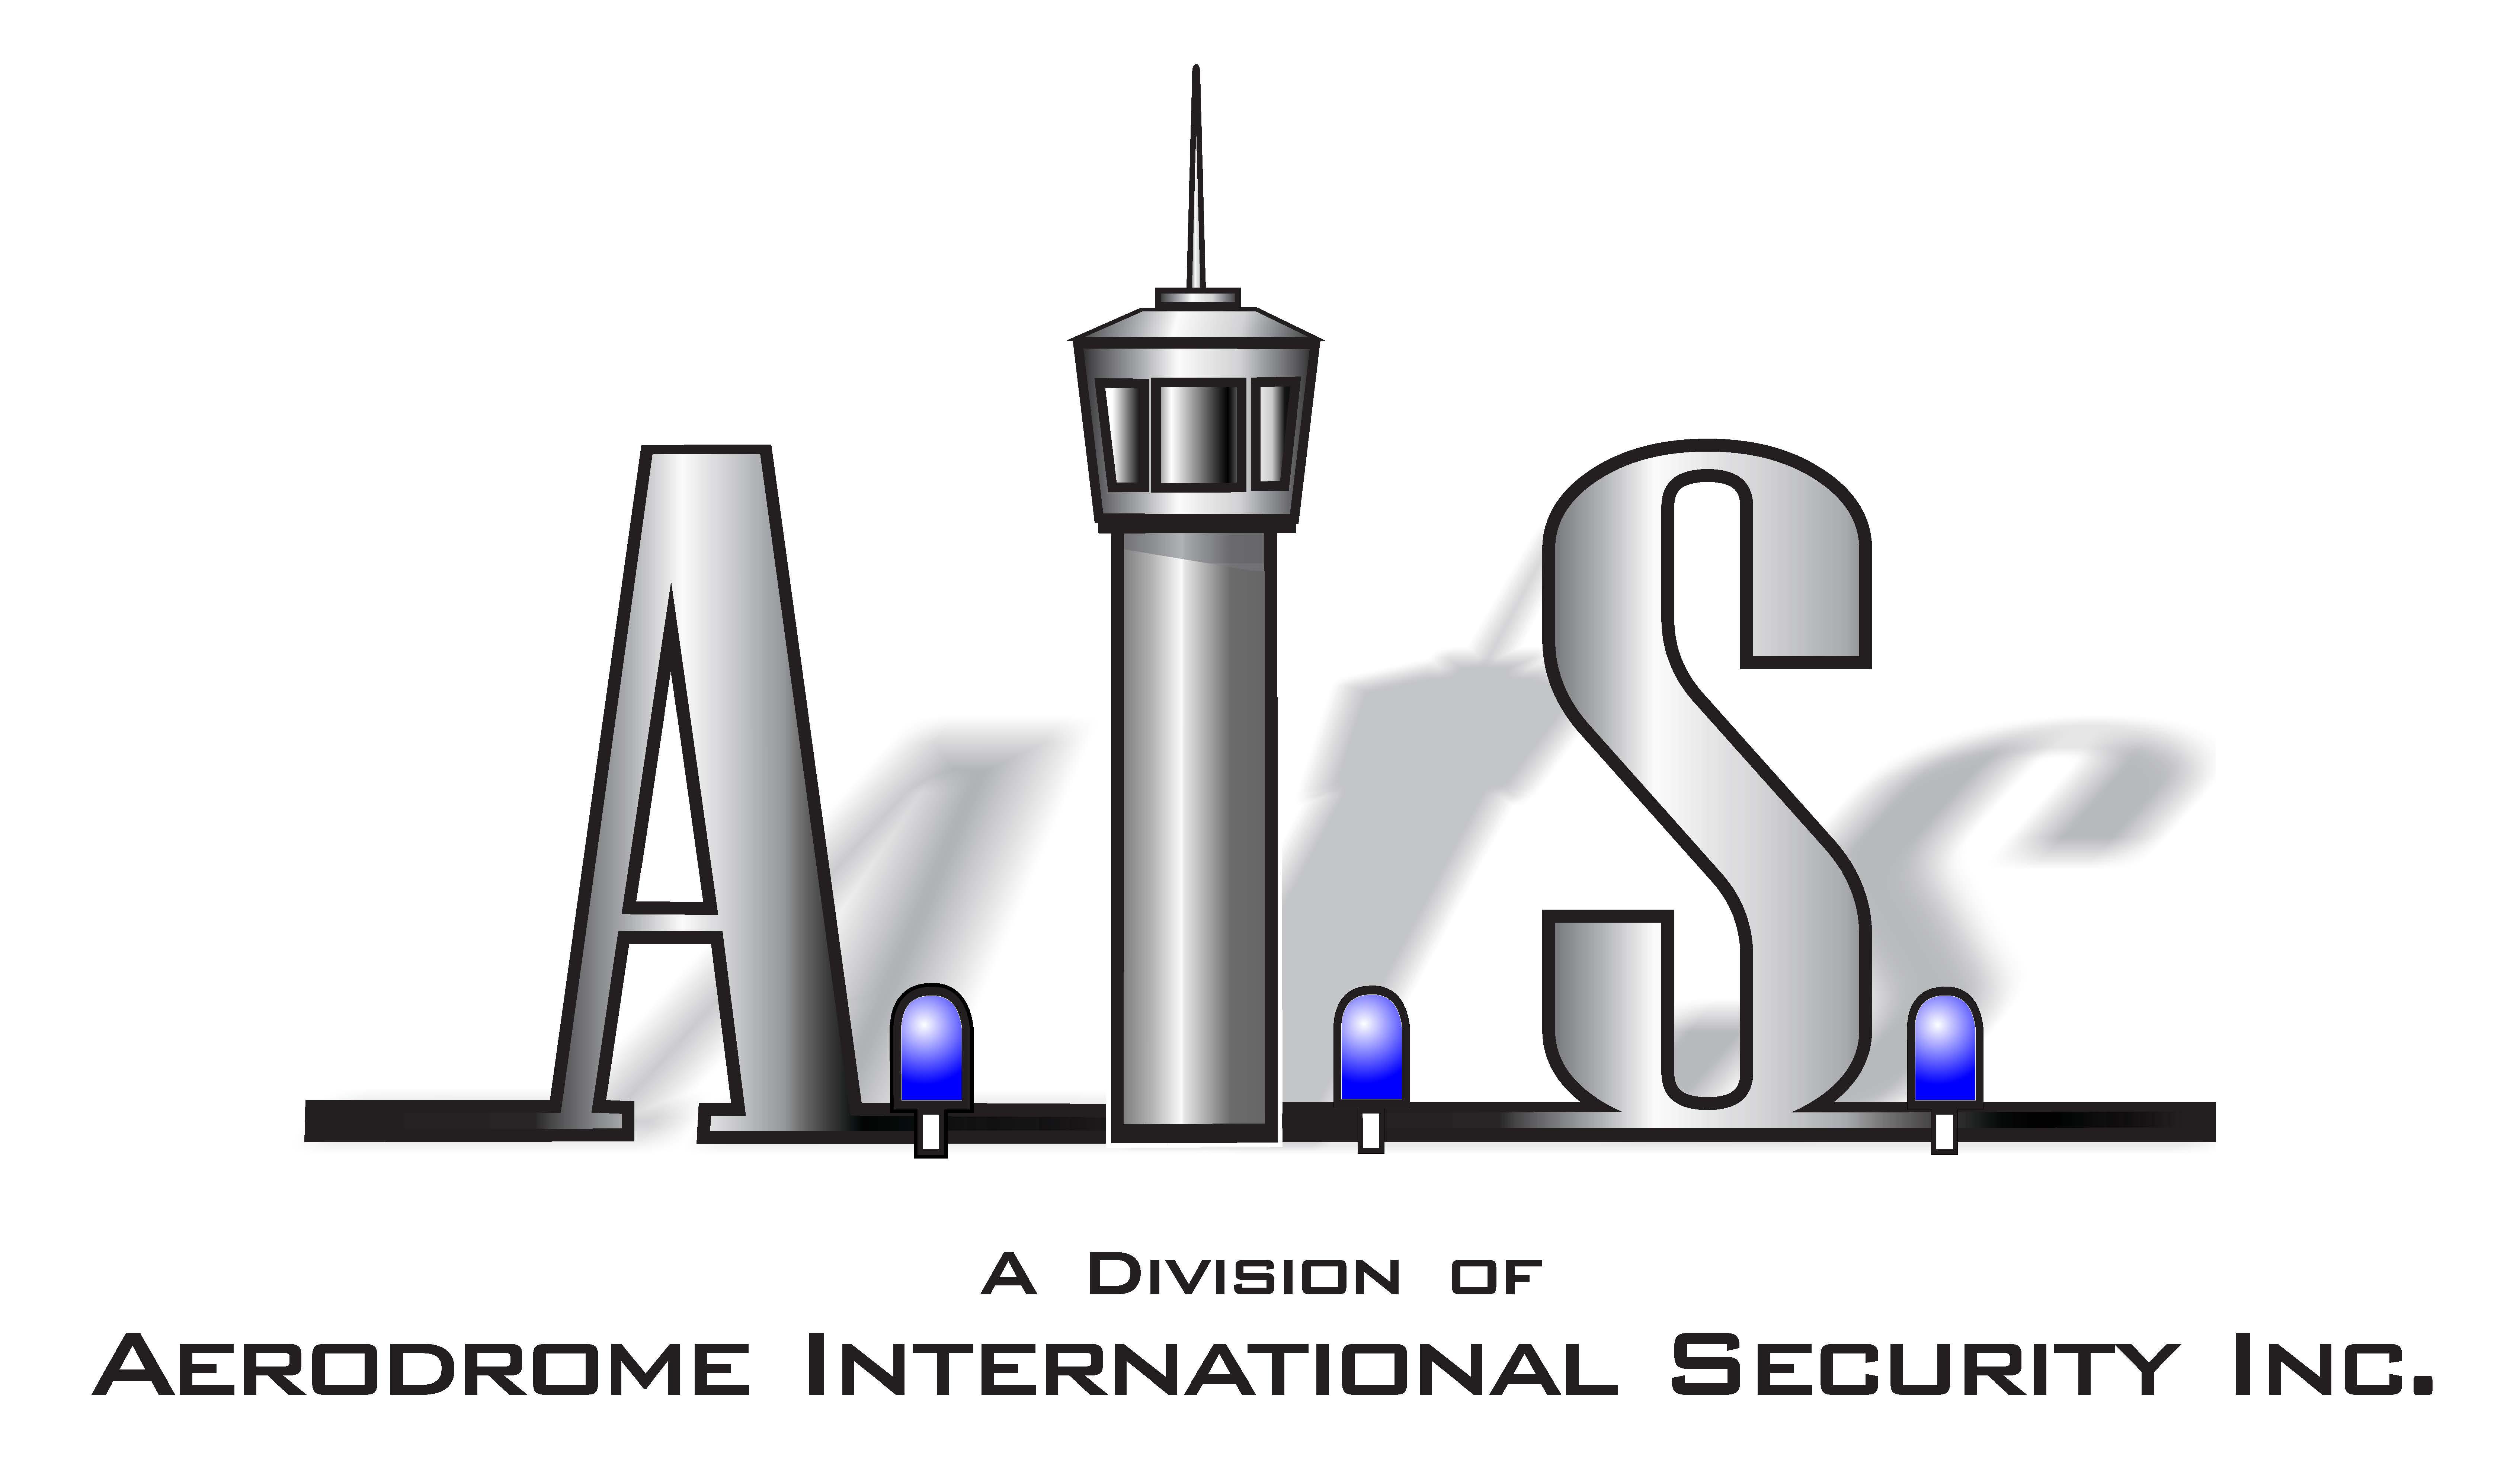 Aerodrome International Security Inc